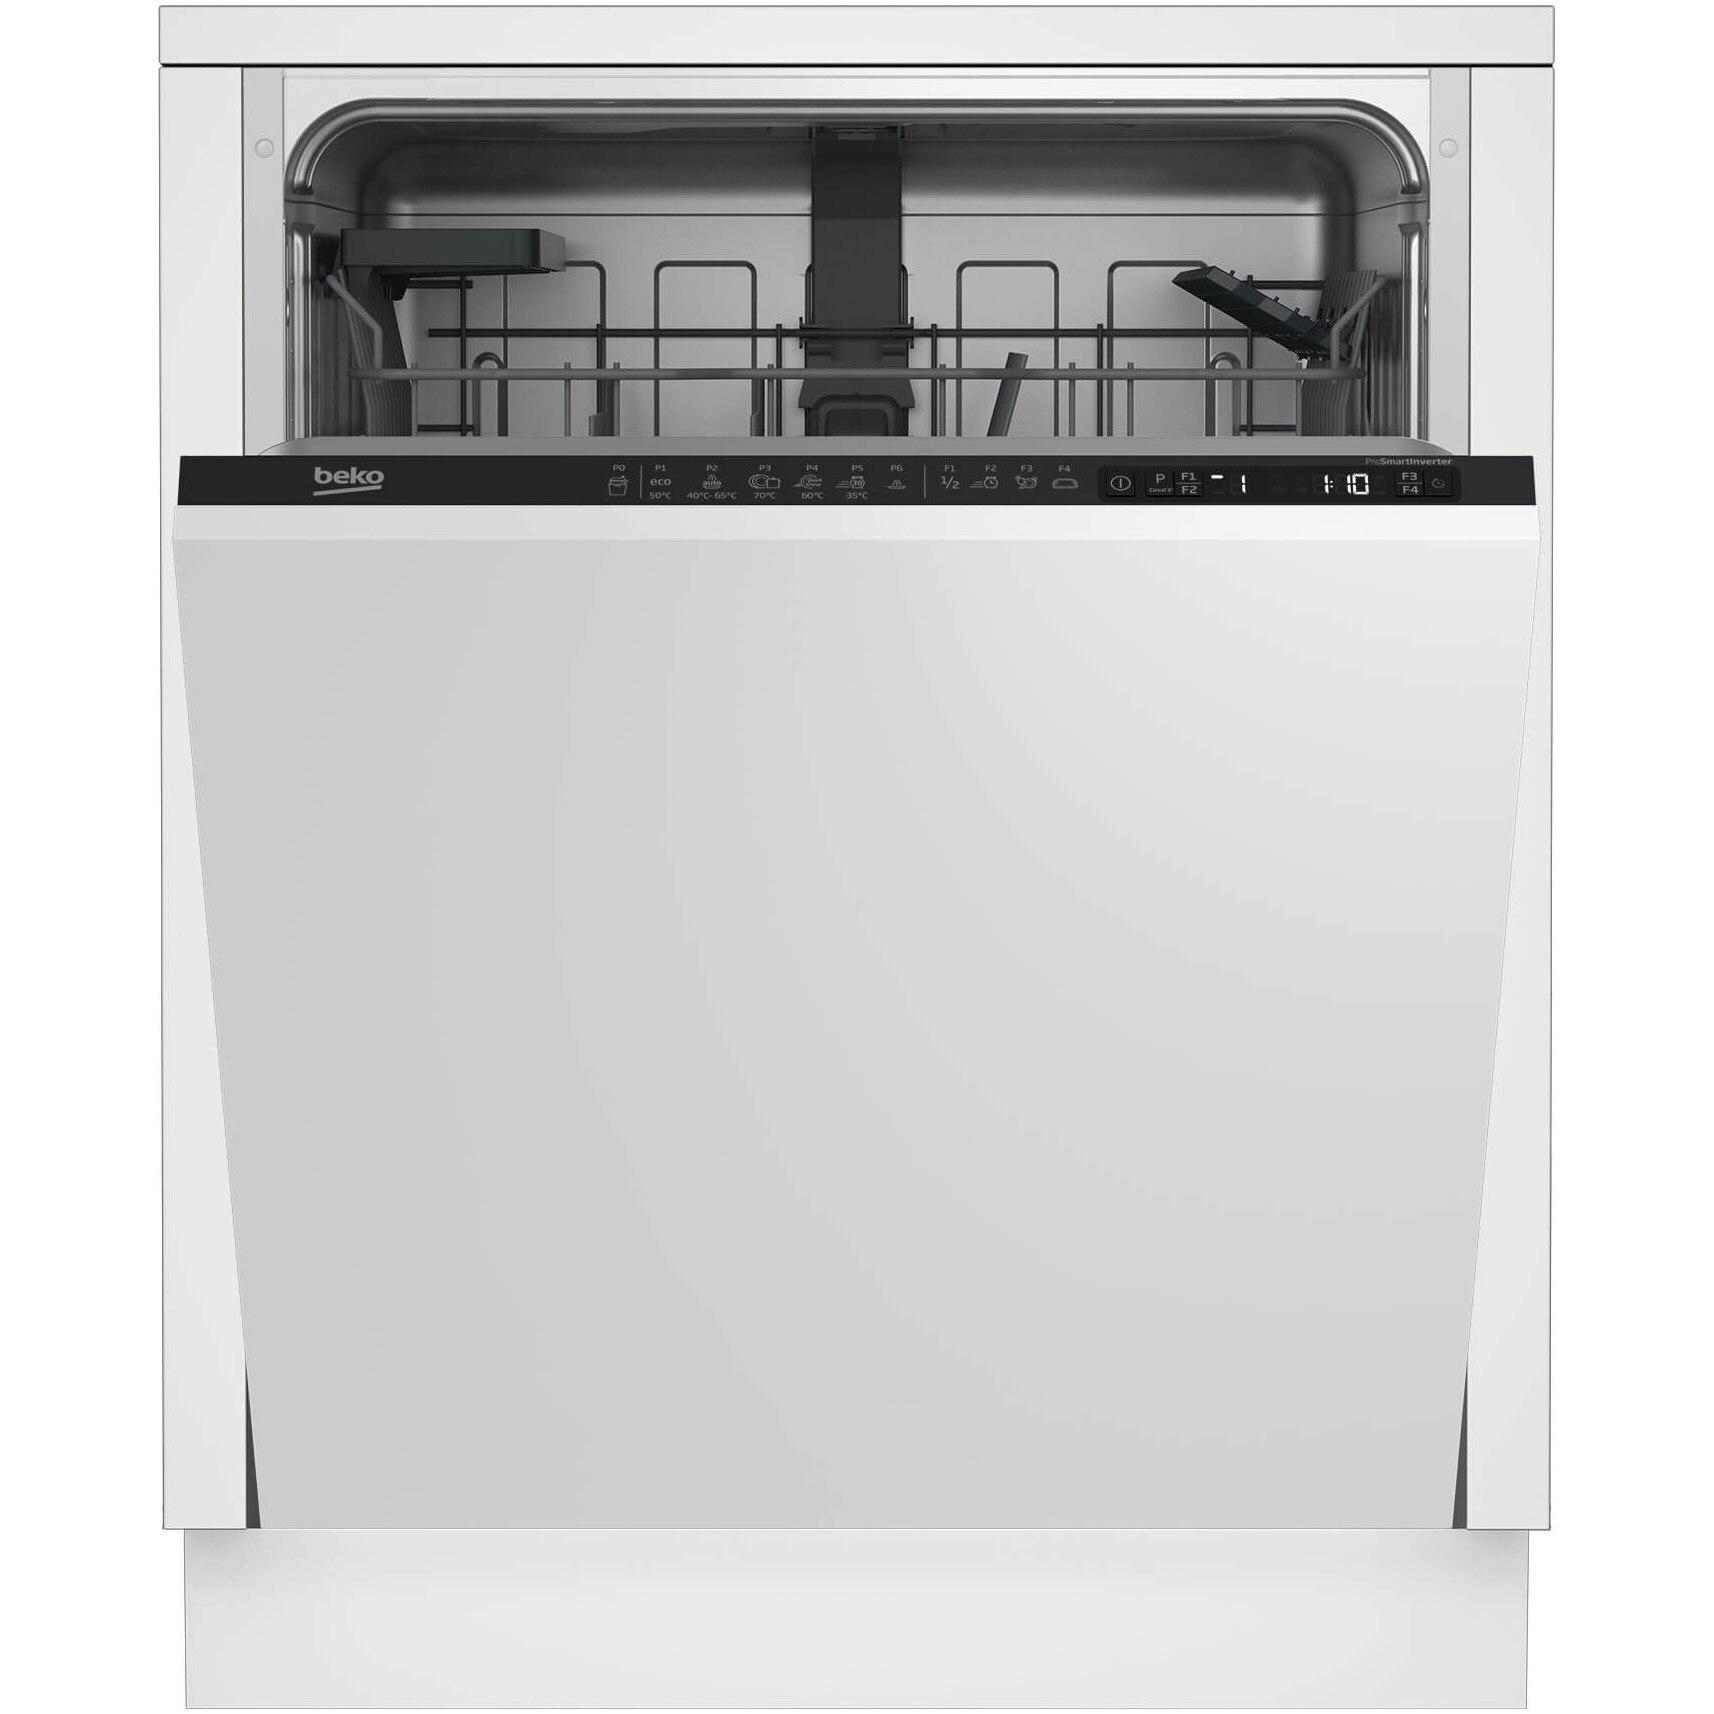 Fotografie Masina de spalat vase incorporabila Beko DIN26421, 14 seturi, 6 programe, Motor ProSmart Inverter, Fast+, cos tacamuri flexibil, Clasa A++, 60 cm